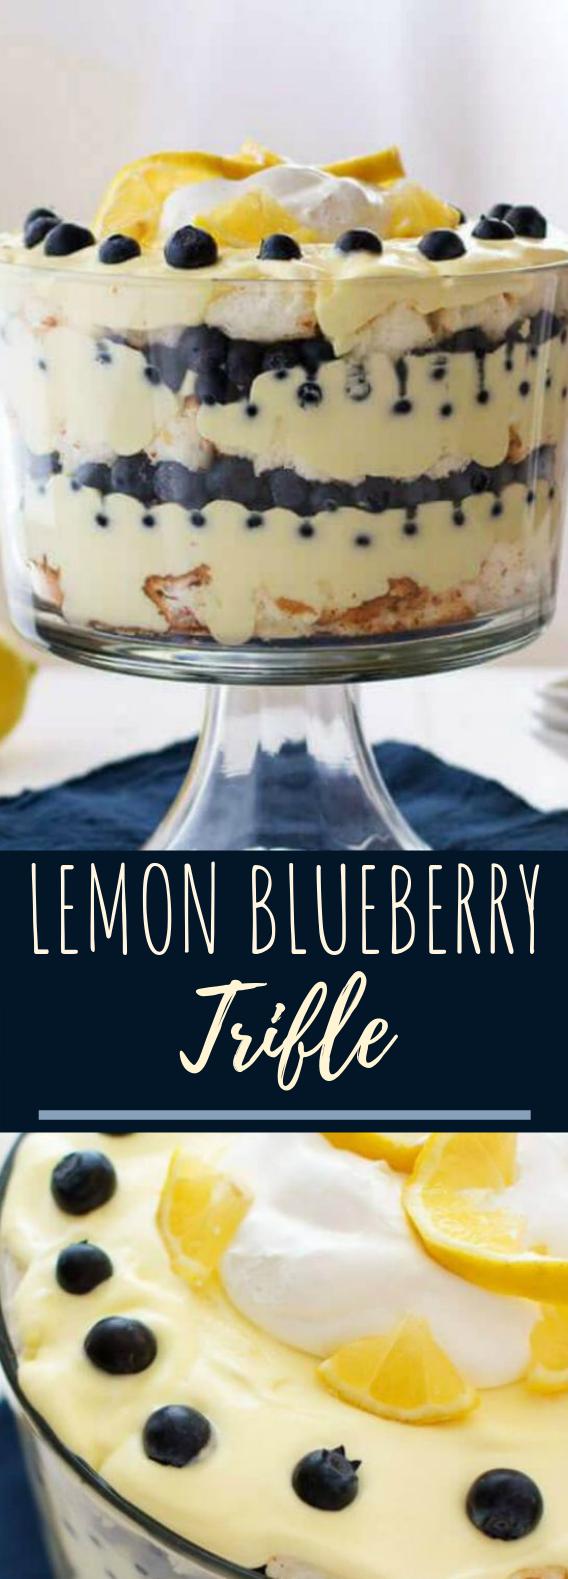 Lemon Blueberry Trifle #summer #dessert